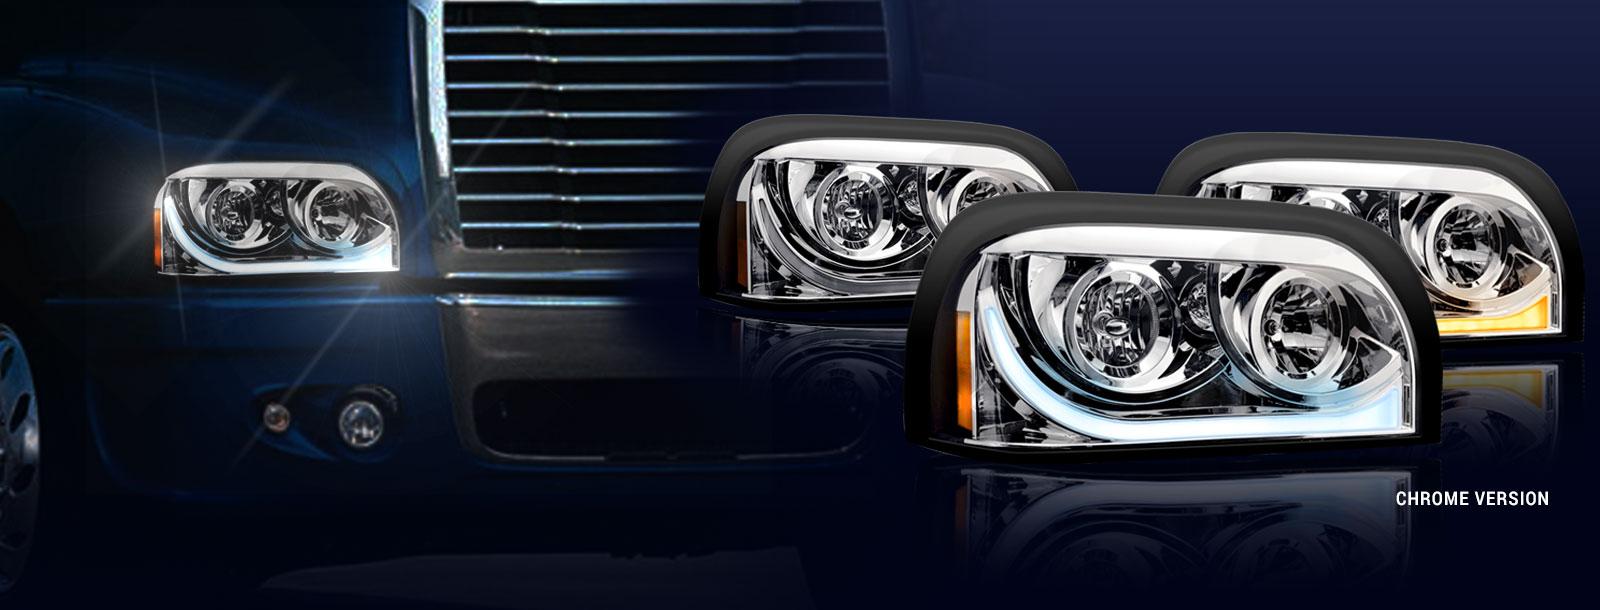 Freight liner Century Headlights